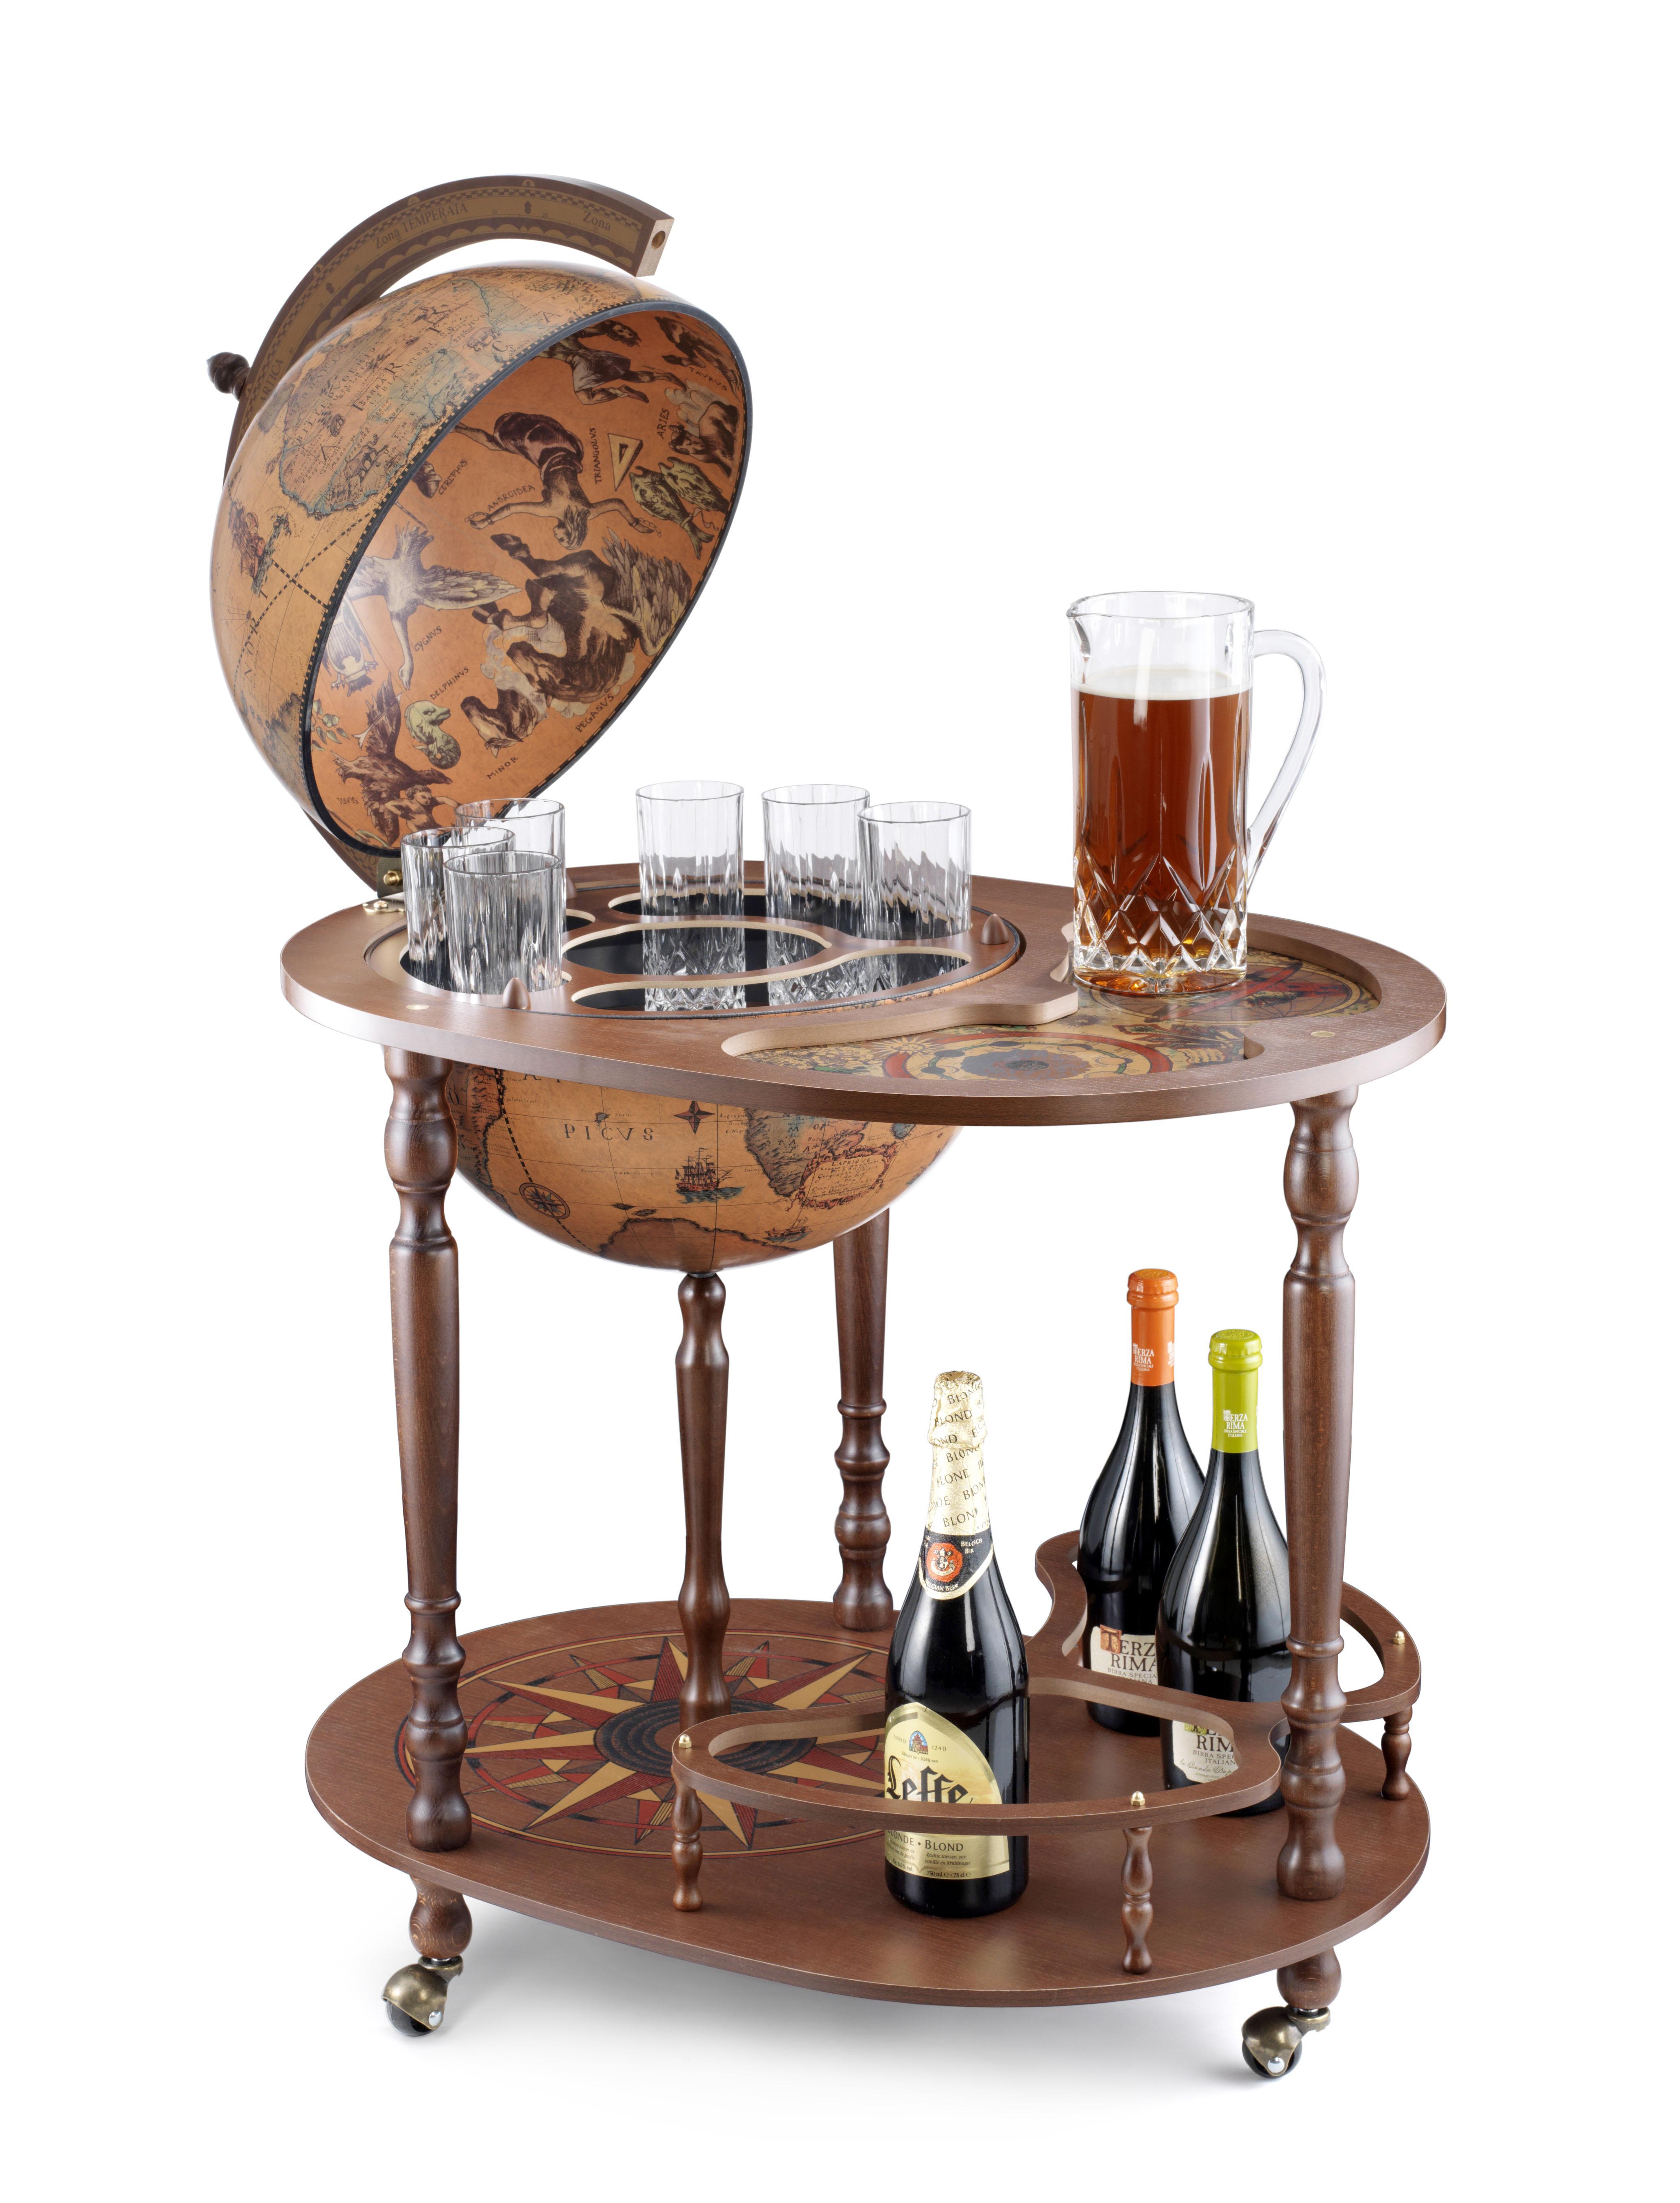 Giasone bar globe 40 Classic - 16e-eeuwse kaart